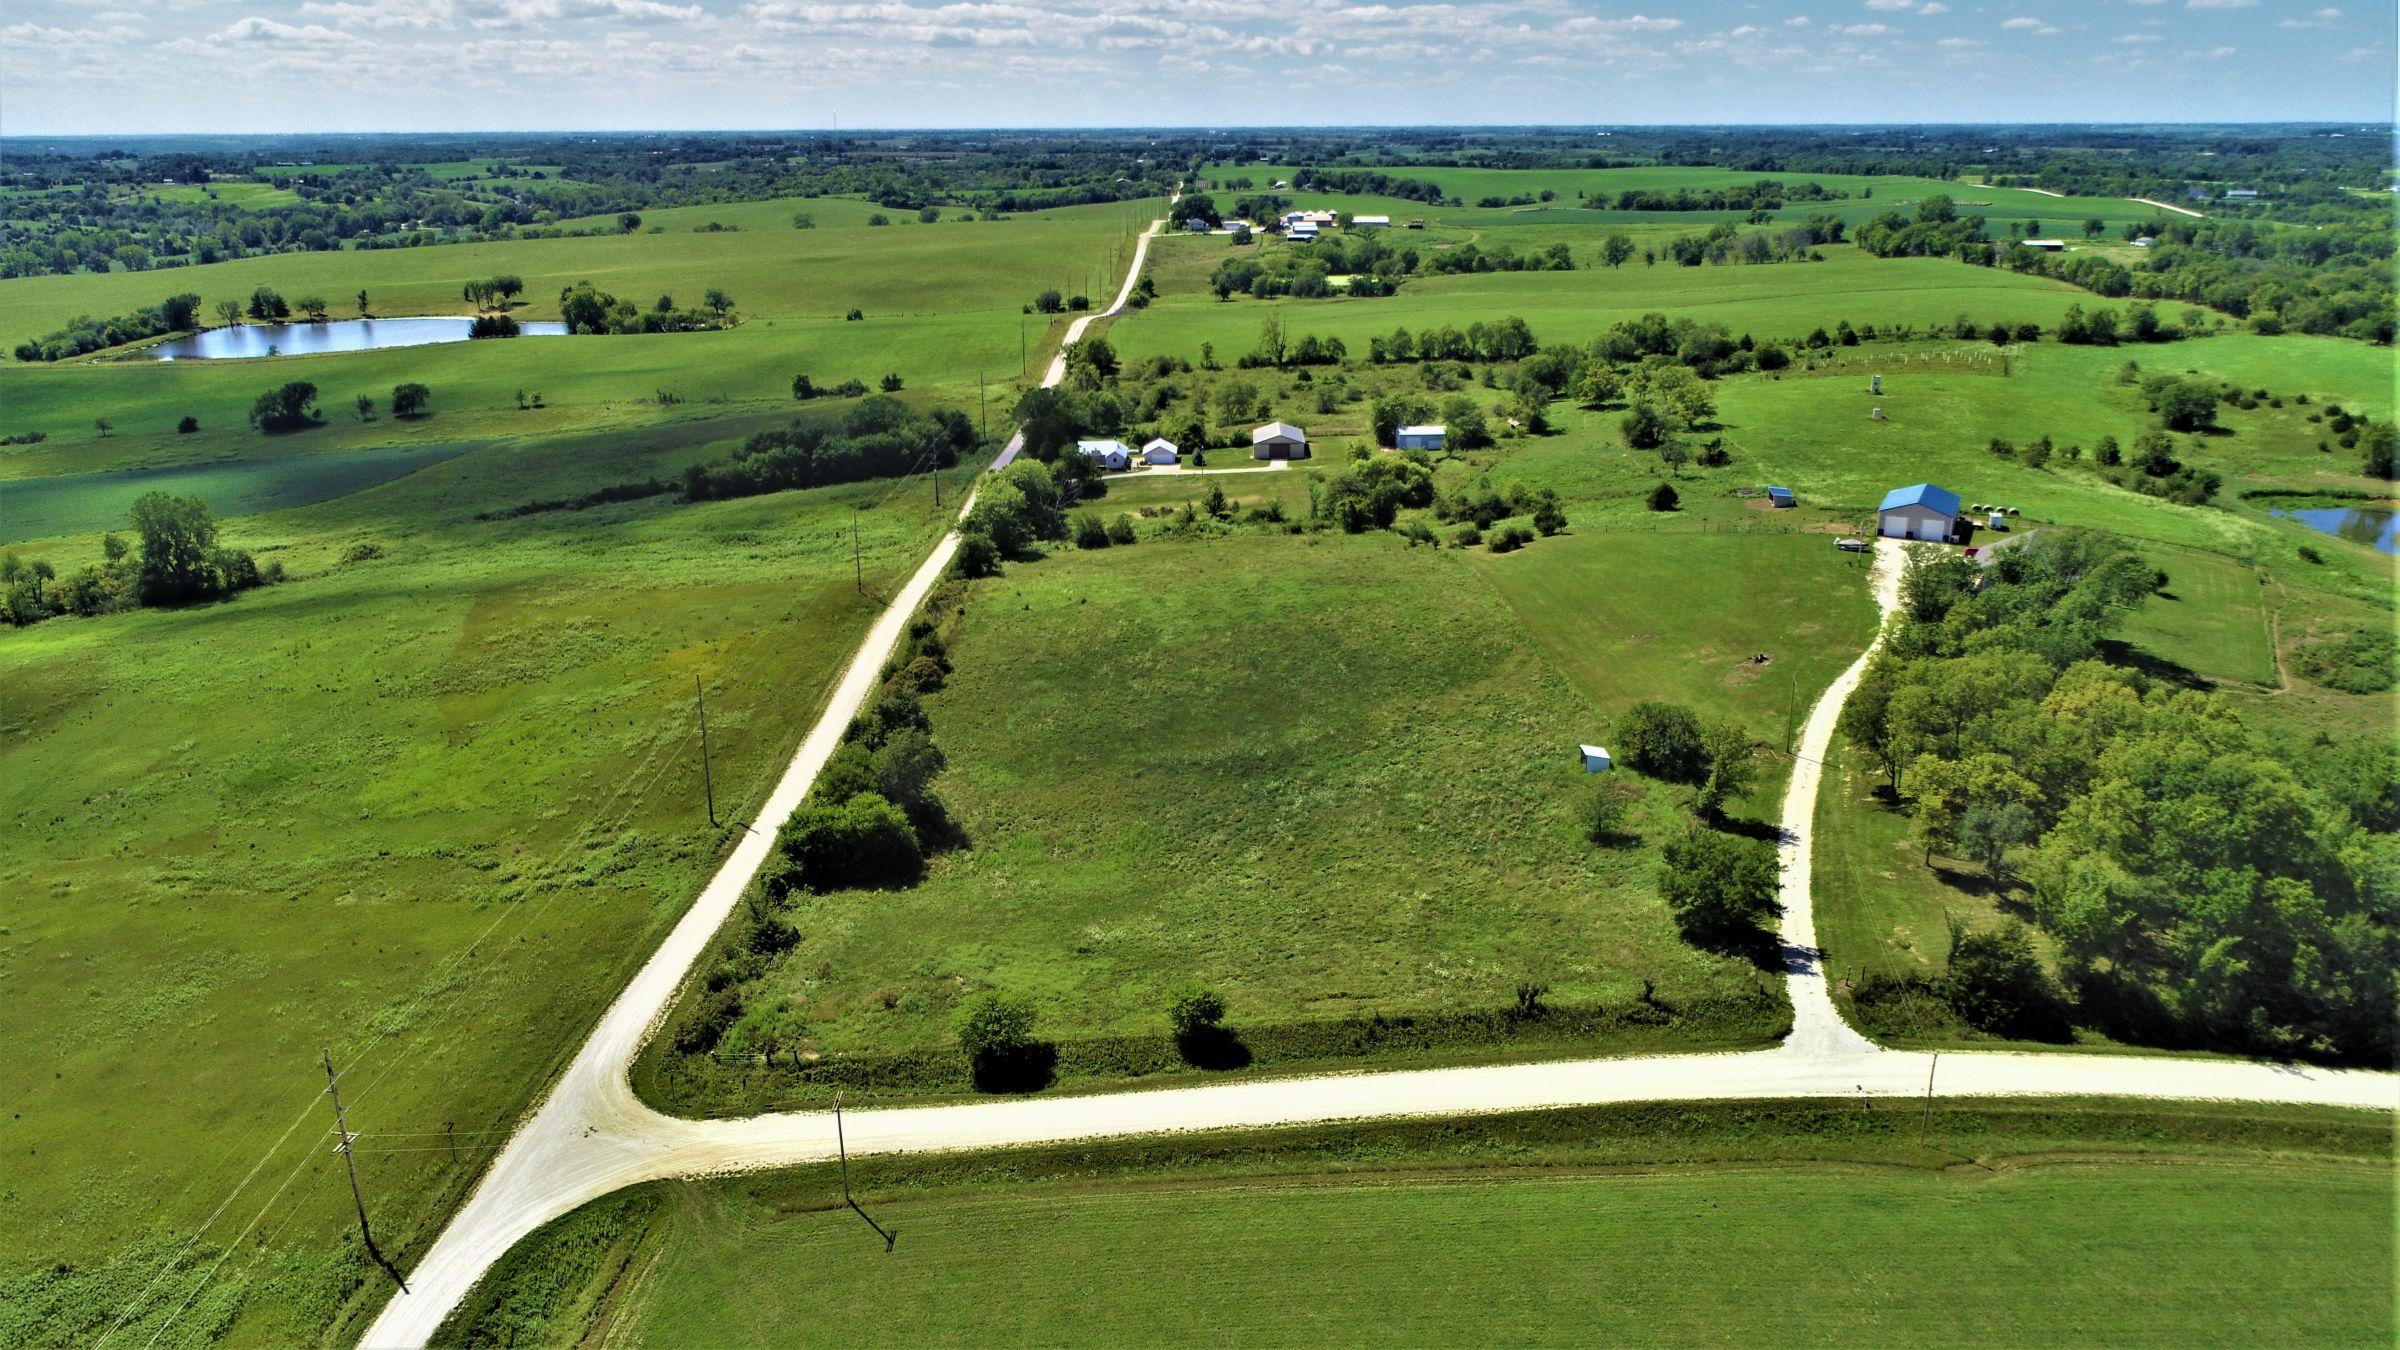 land-warren-county-iowa-6-acres-listing-number-15709-1-2021-08-27-202003.JPG